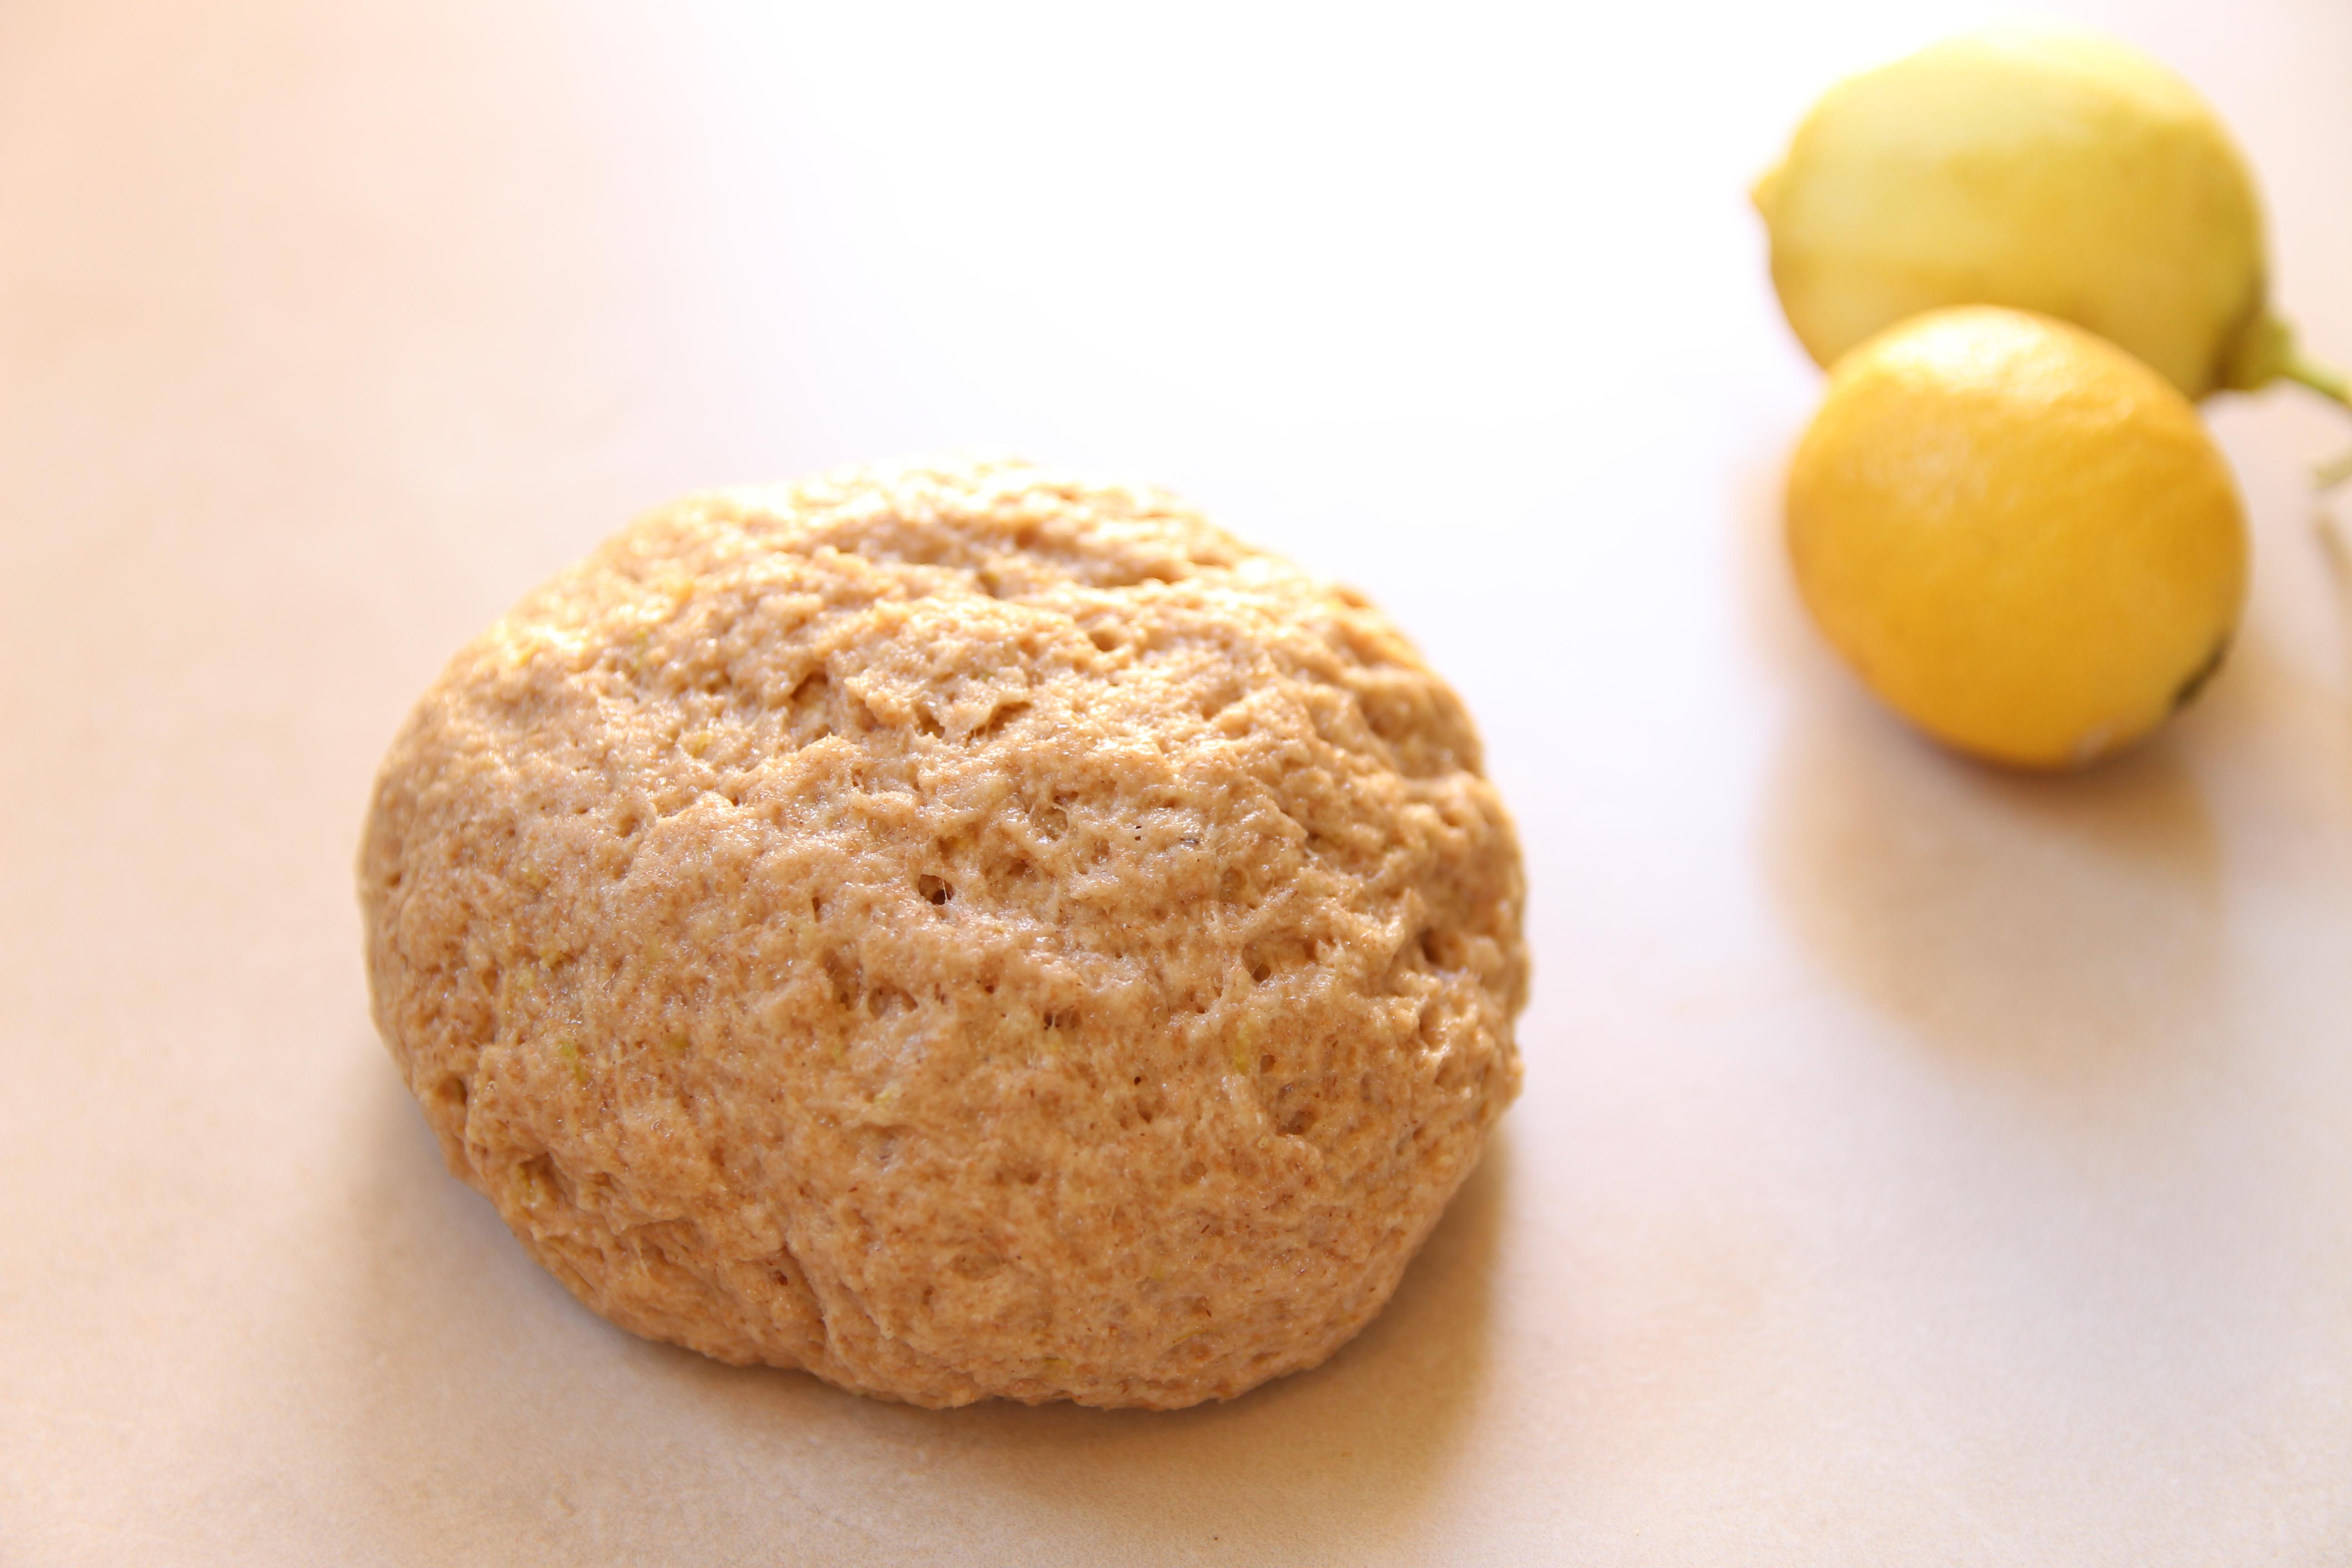 biscotti cookie dough